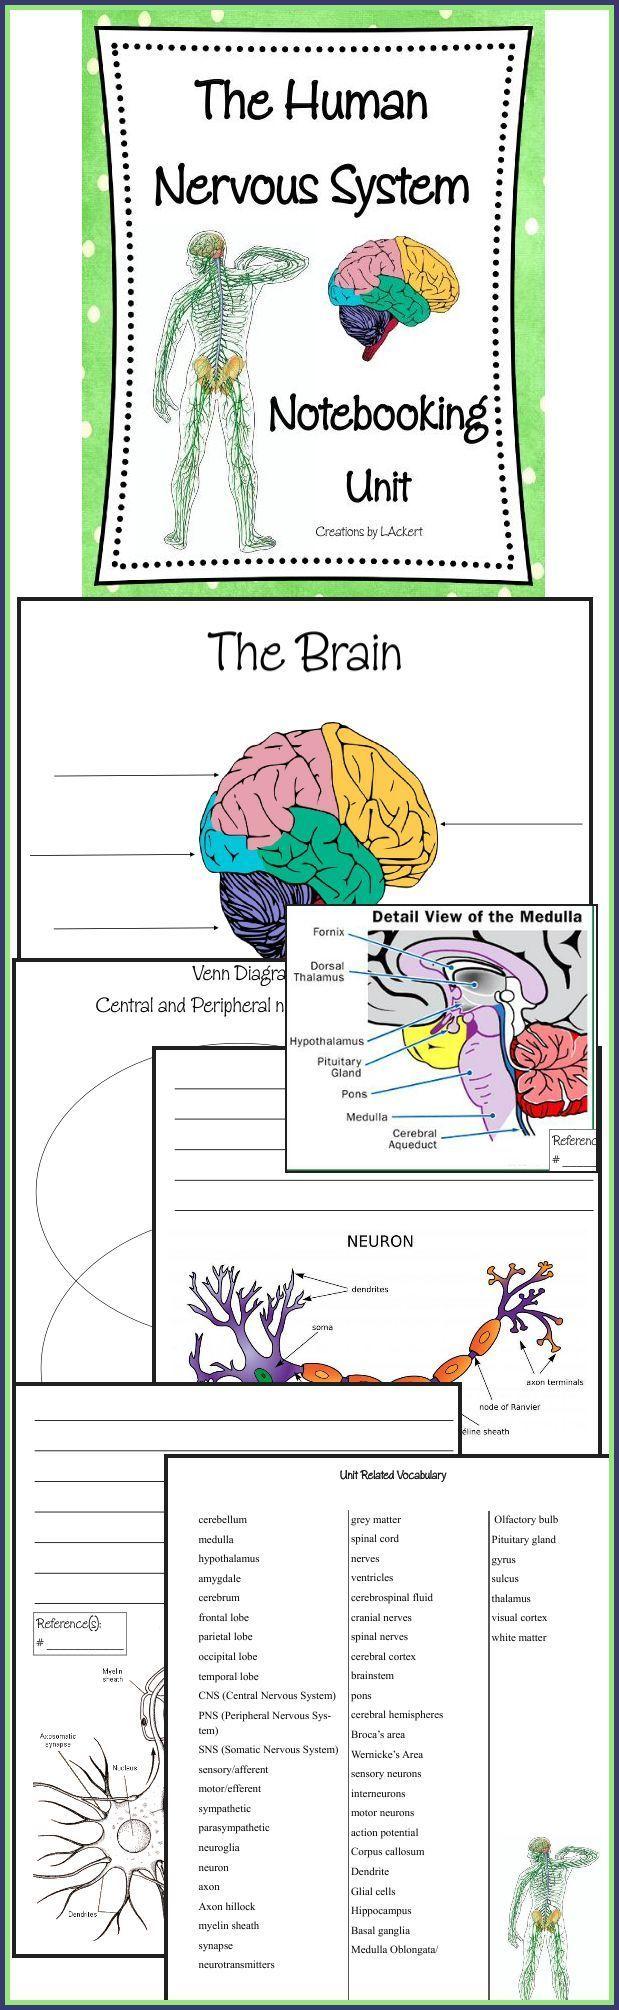 brainnervous system essay Leukemia brainnervous system bonejoint endocrine soft tissues spot maps and from hsc 4504 at university of florida.